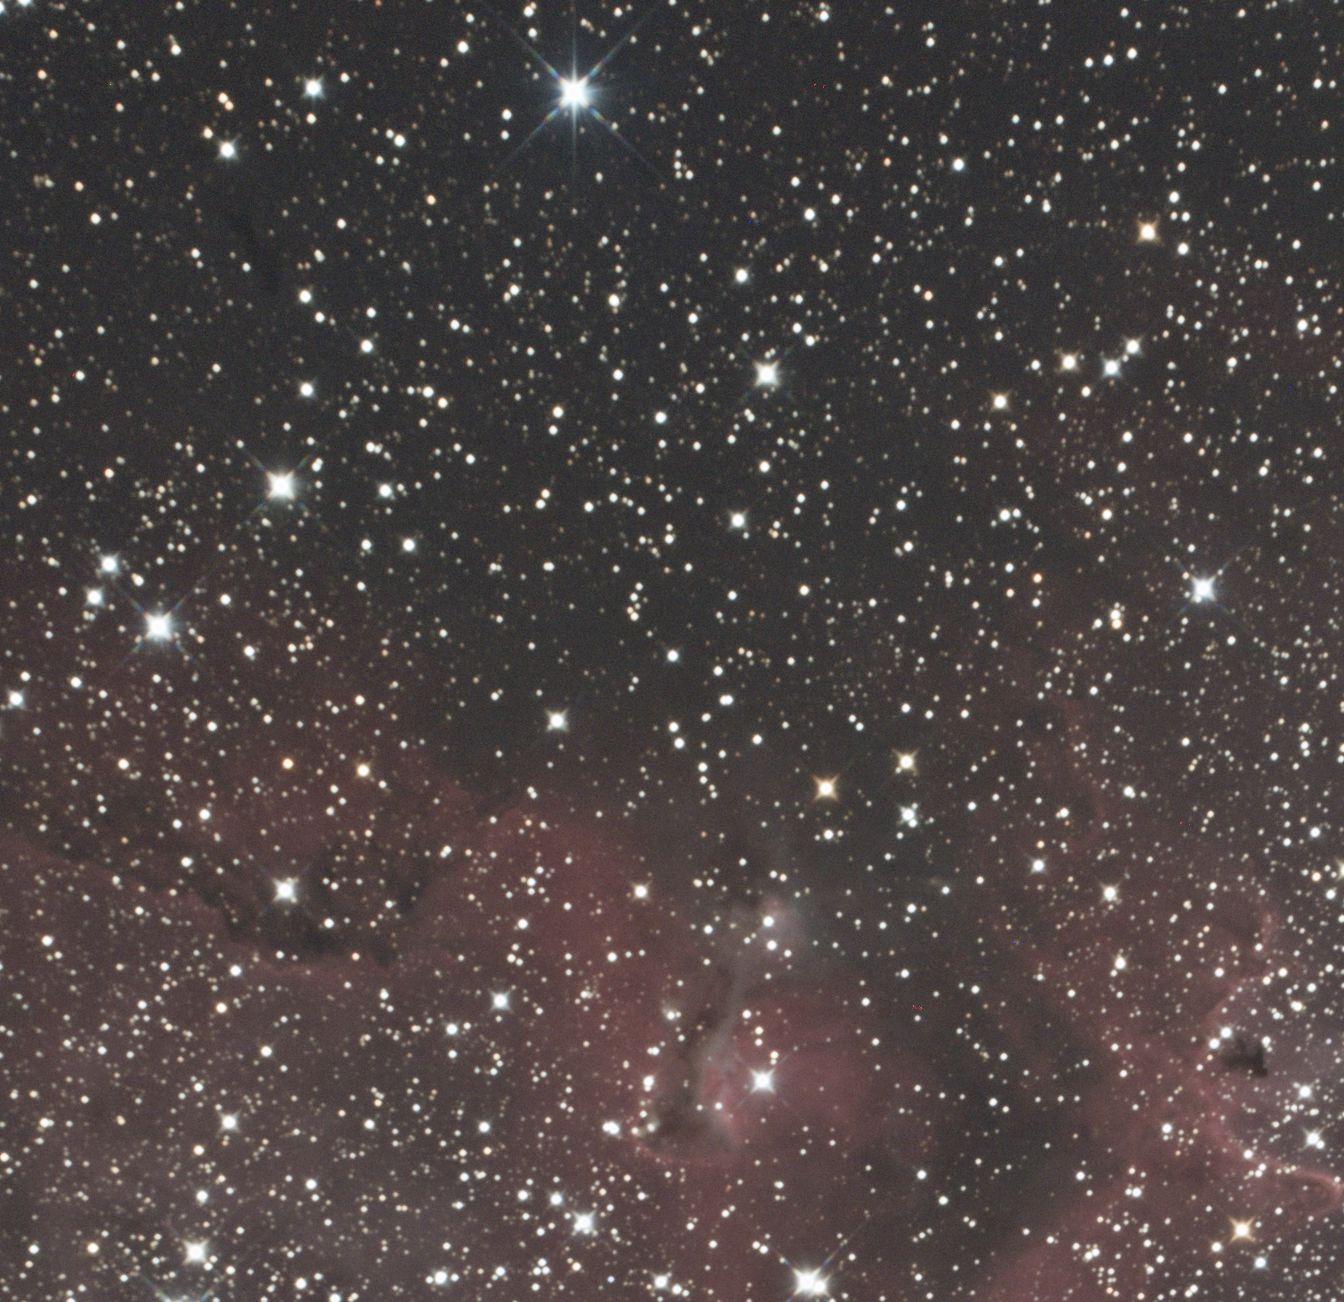 f:id:snct-astro:20210103220706j:plain